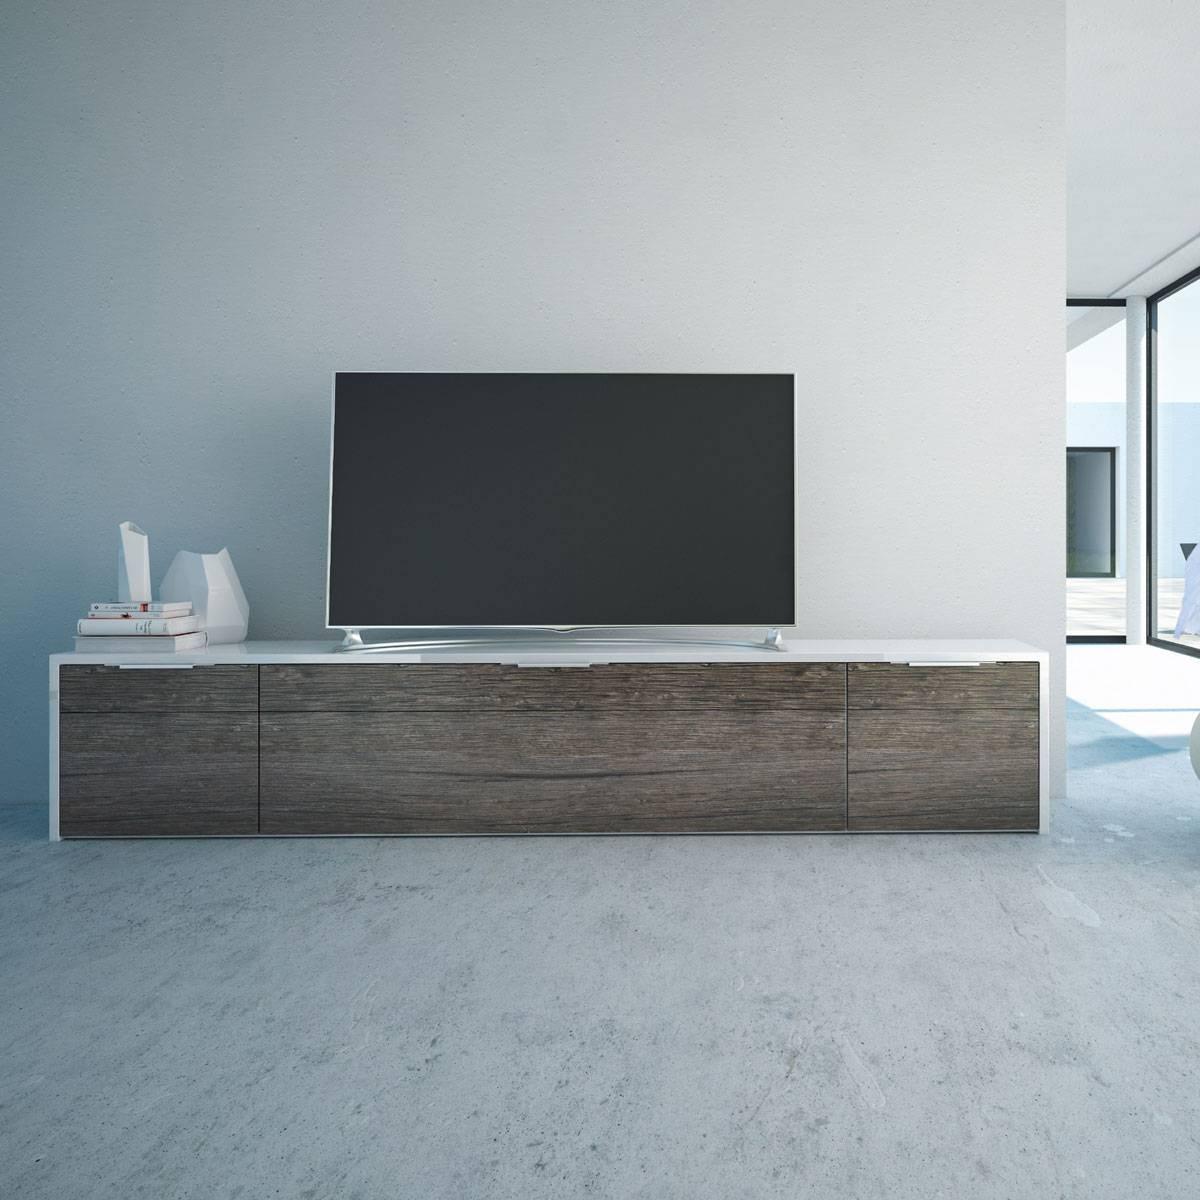 Tv-Möbel, Fernsehmöbel, Möbel Für Lcd Tv, Plasma Möbel Bei Hifi-Tv with regard to Sideboards Tv (Image 28 of 30)